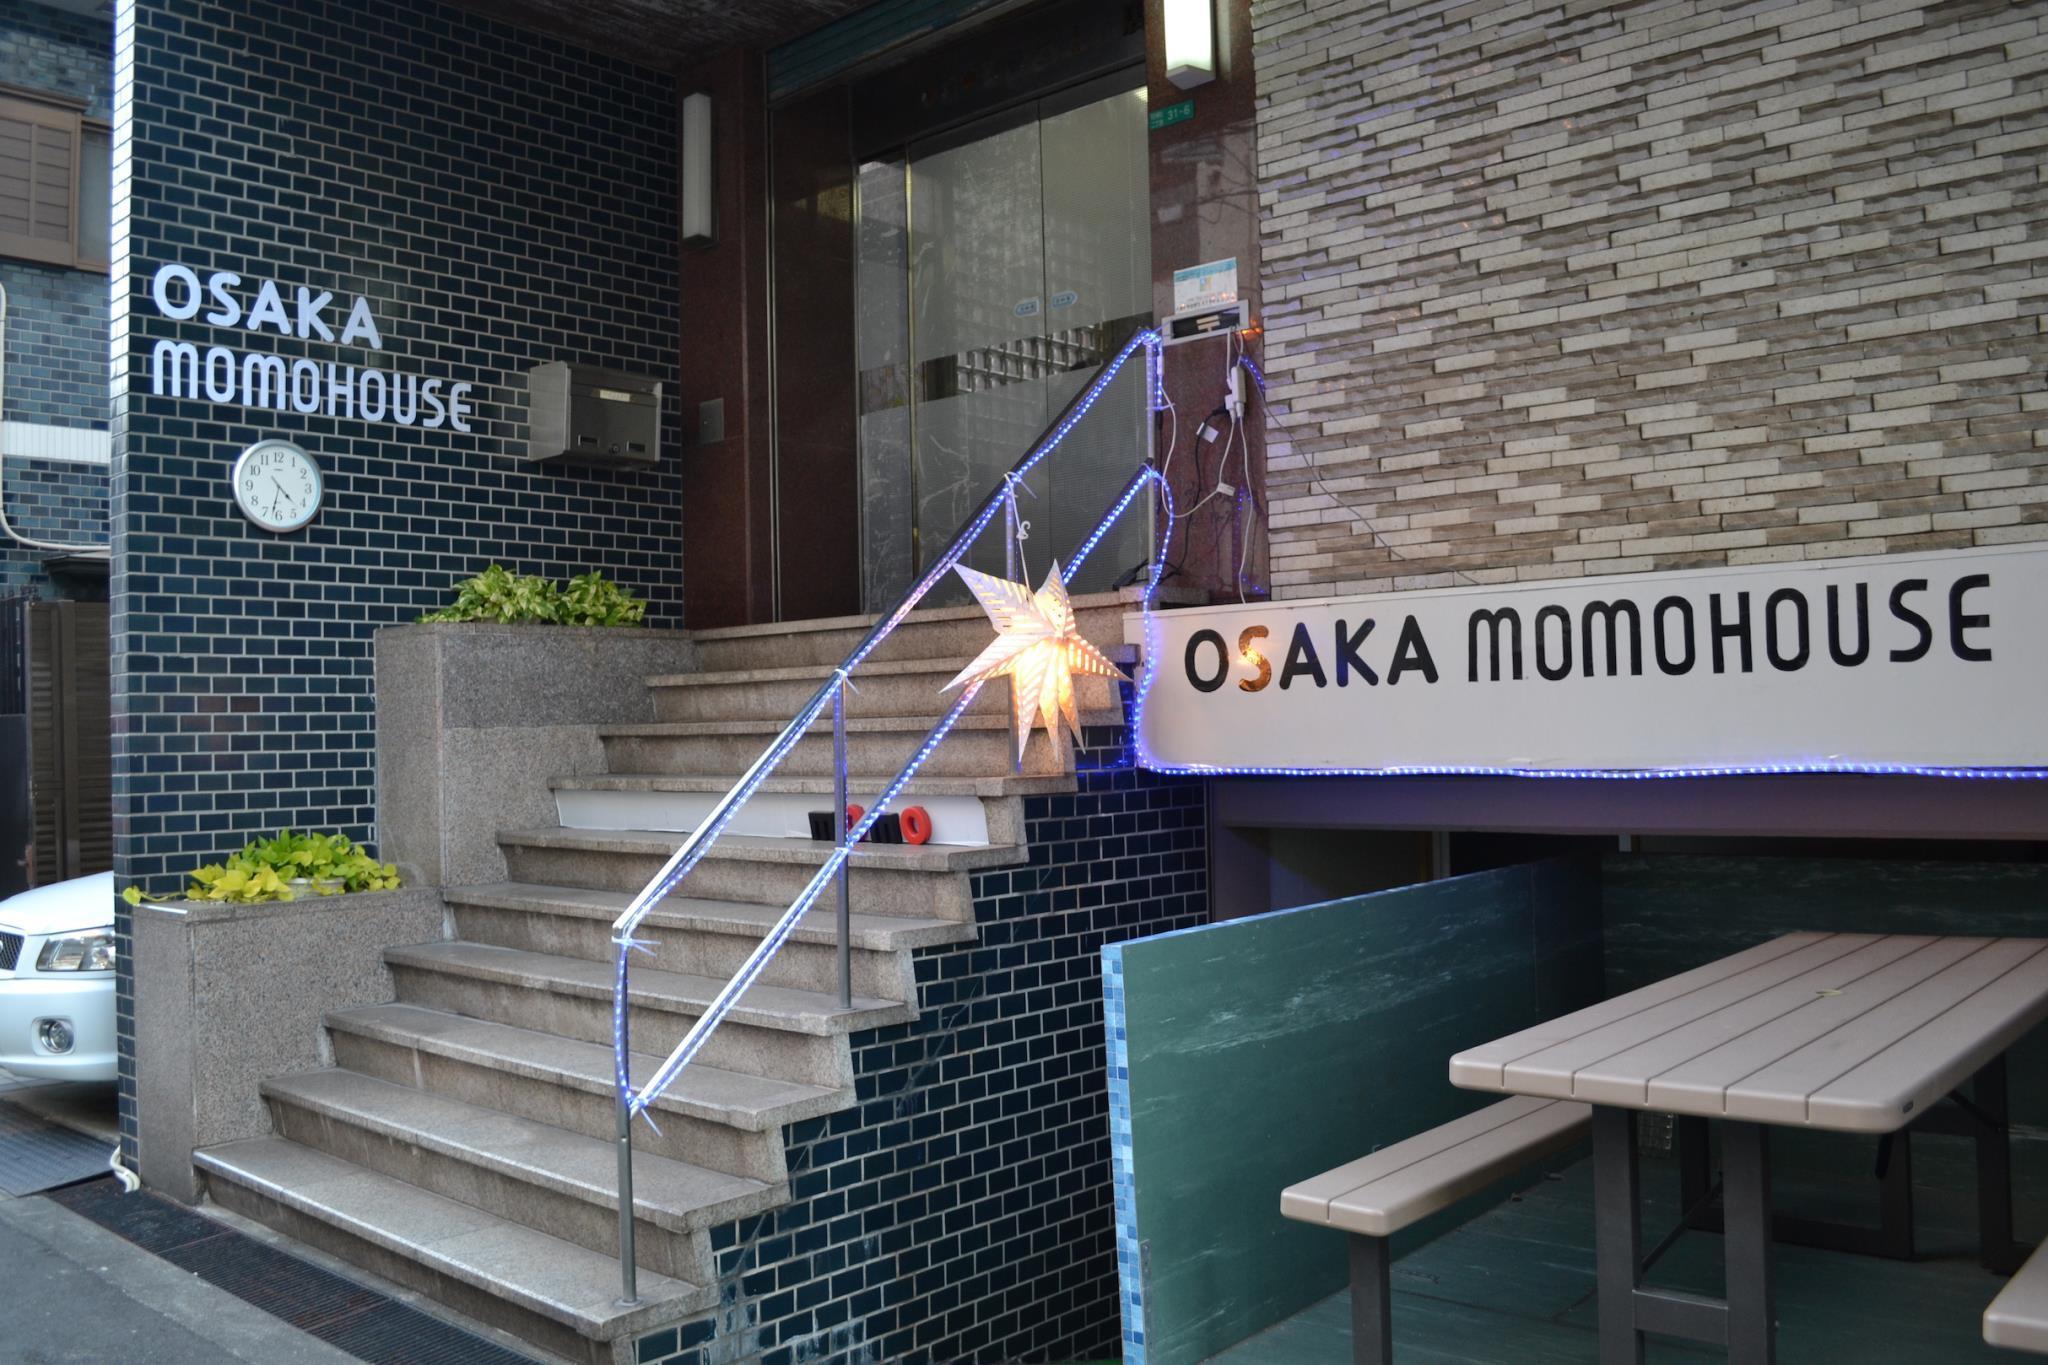 大阪桃子住宅 Osaka momo house